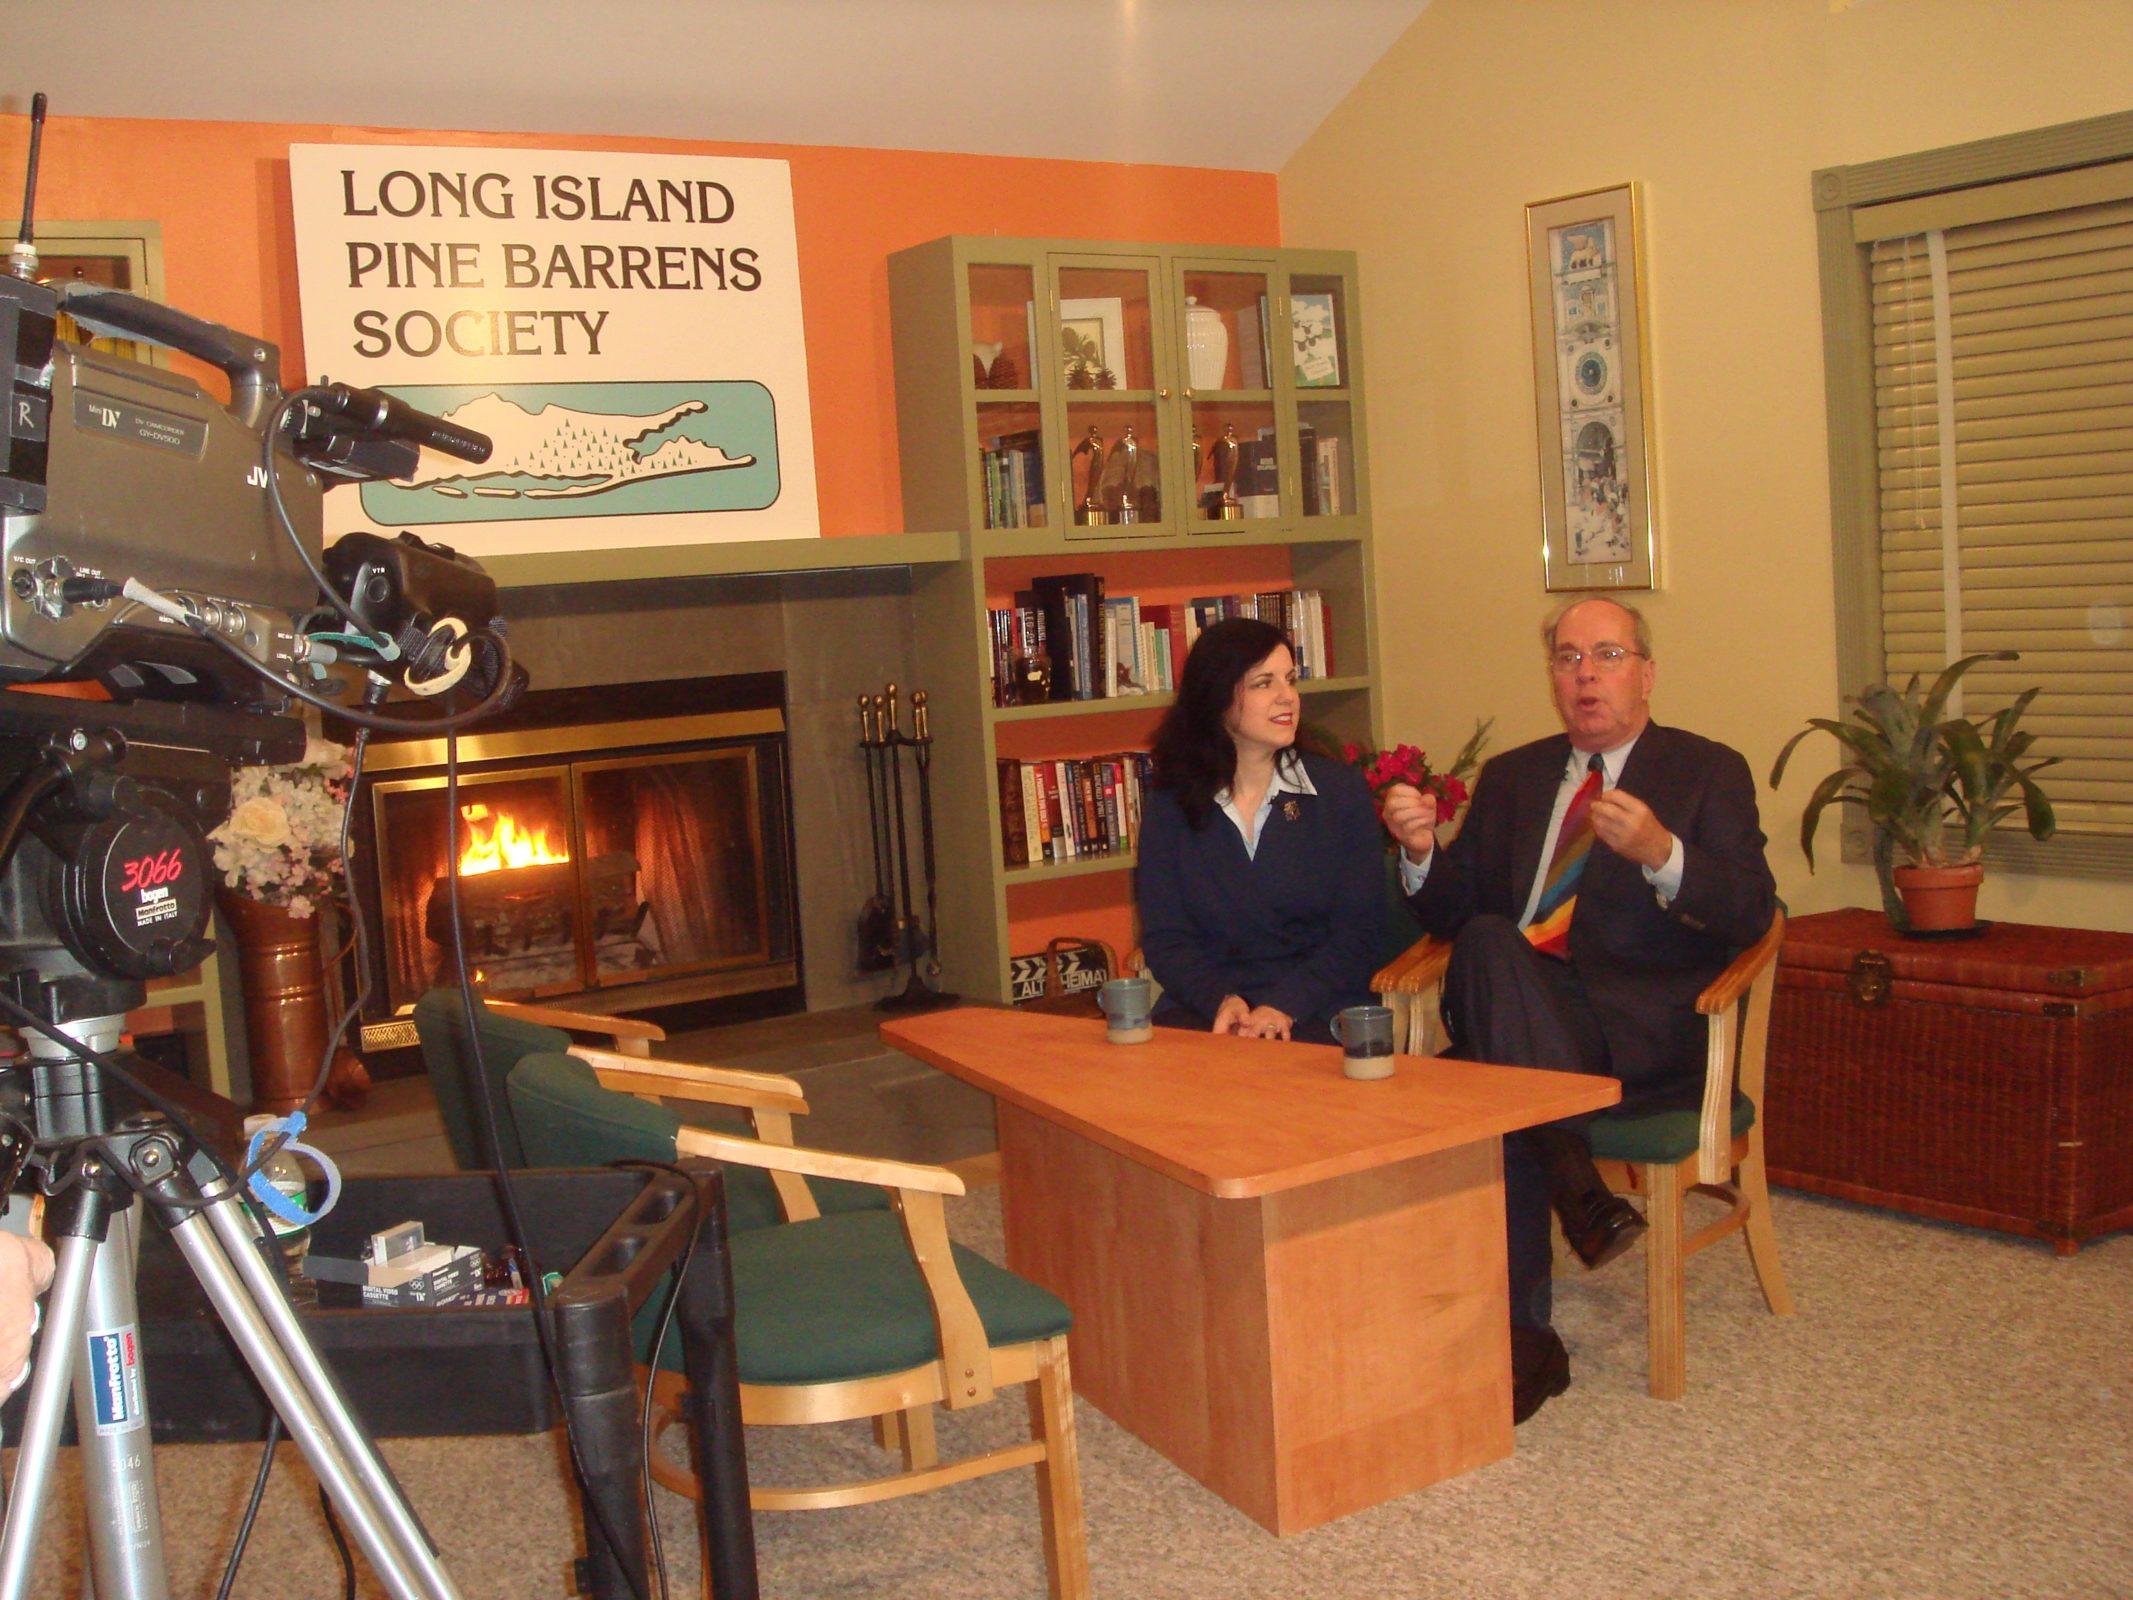 Long Island Pine Barrens Society TV Program